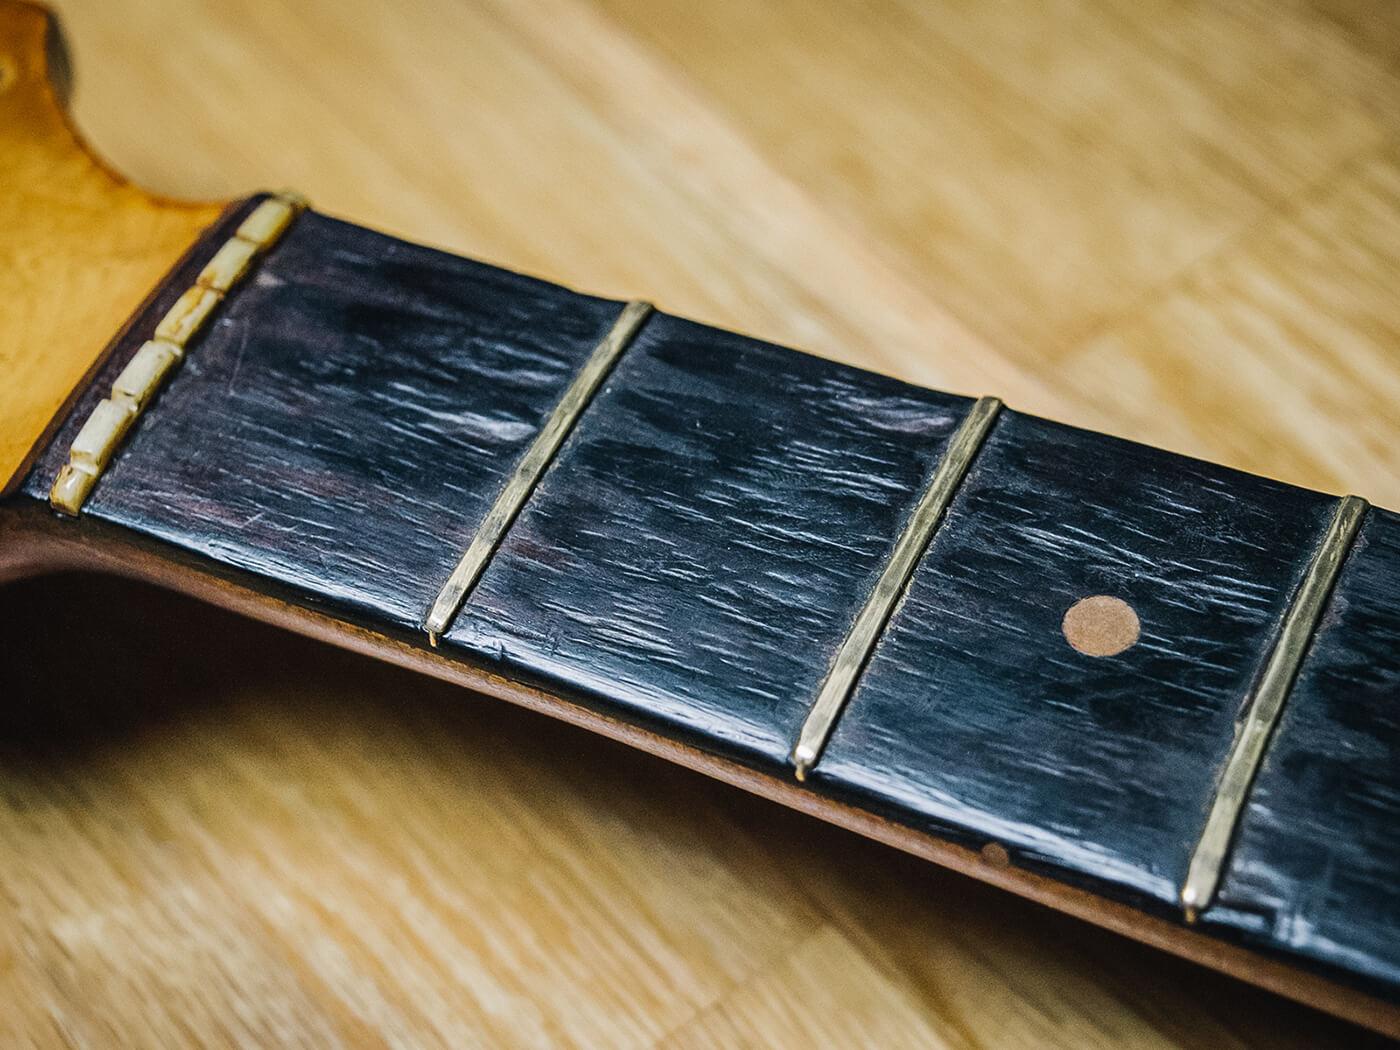 Chris Buck Stratocaster (Before) Fretboard